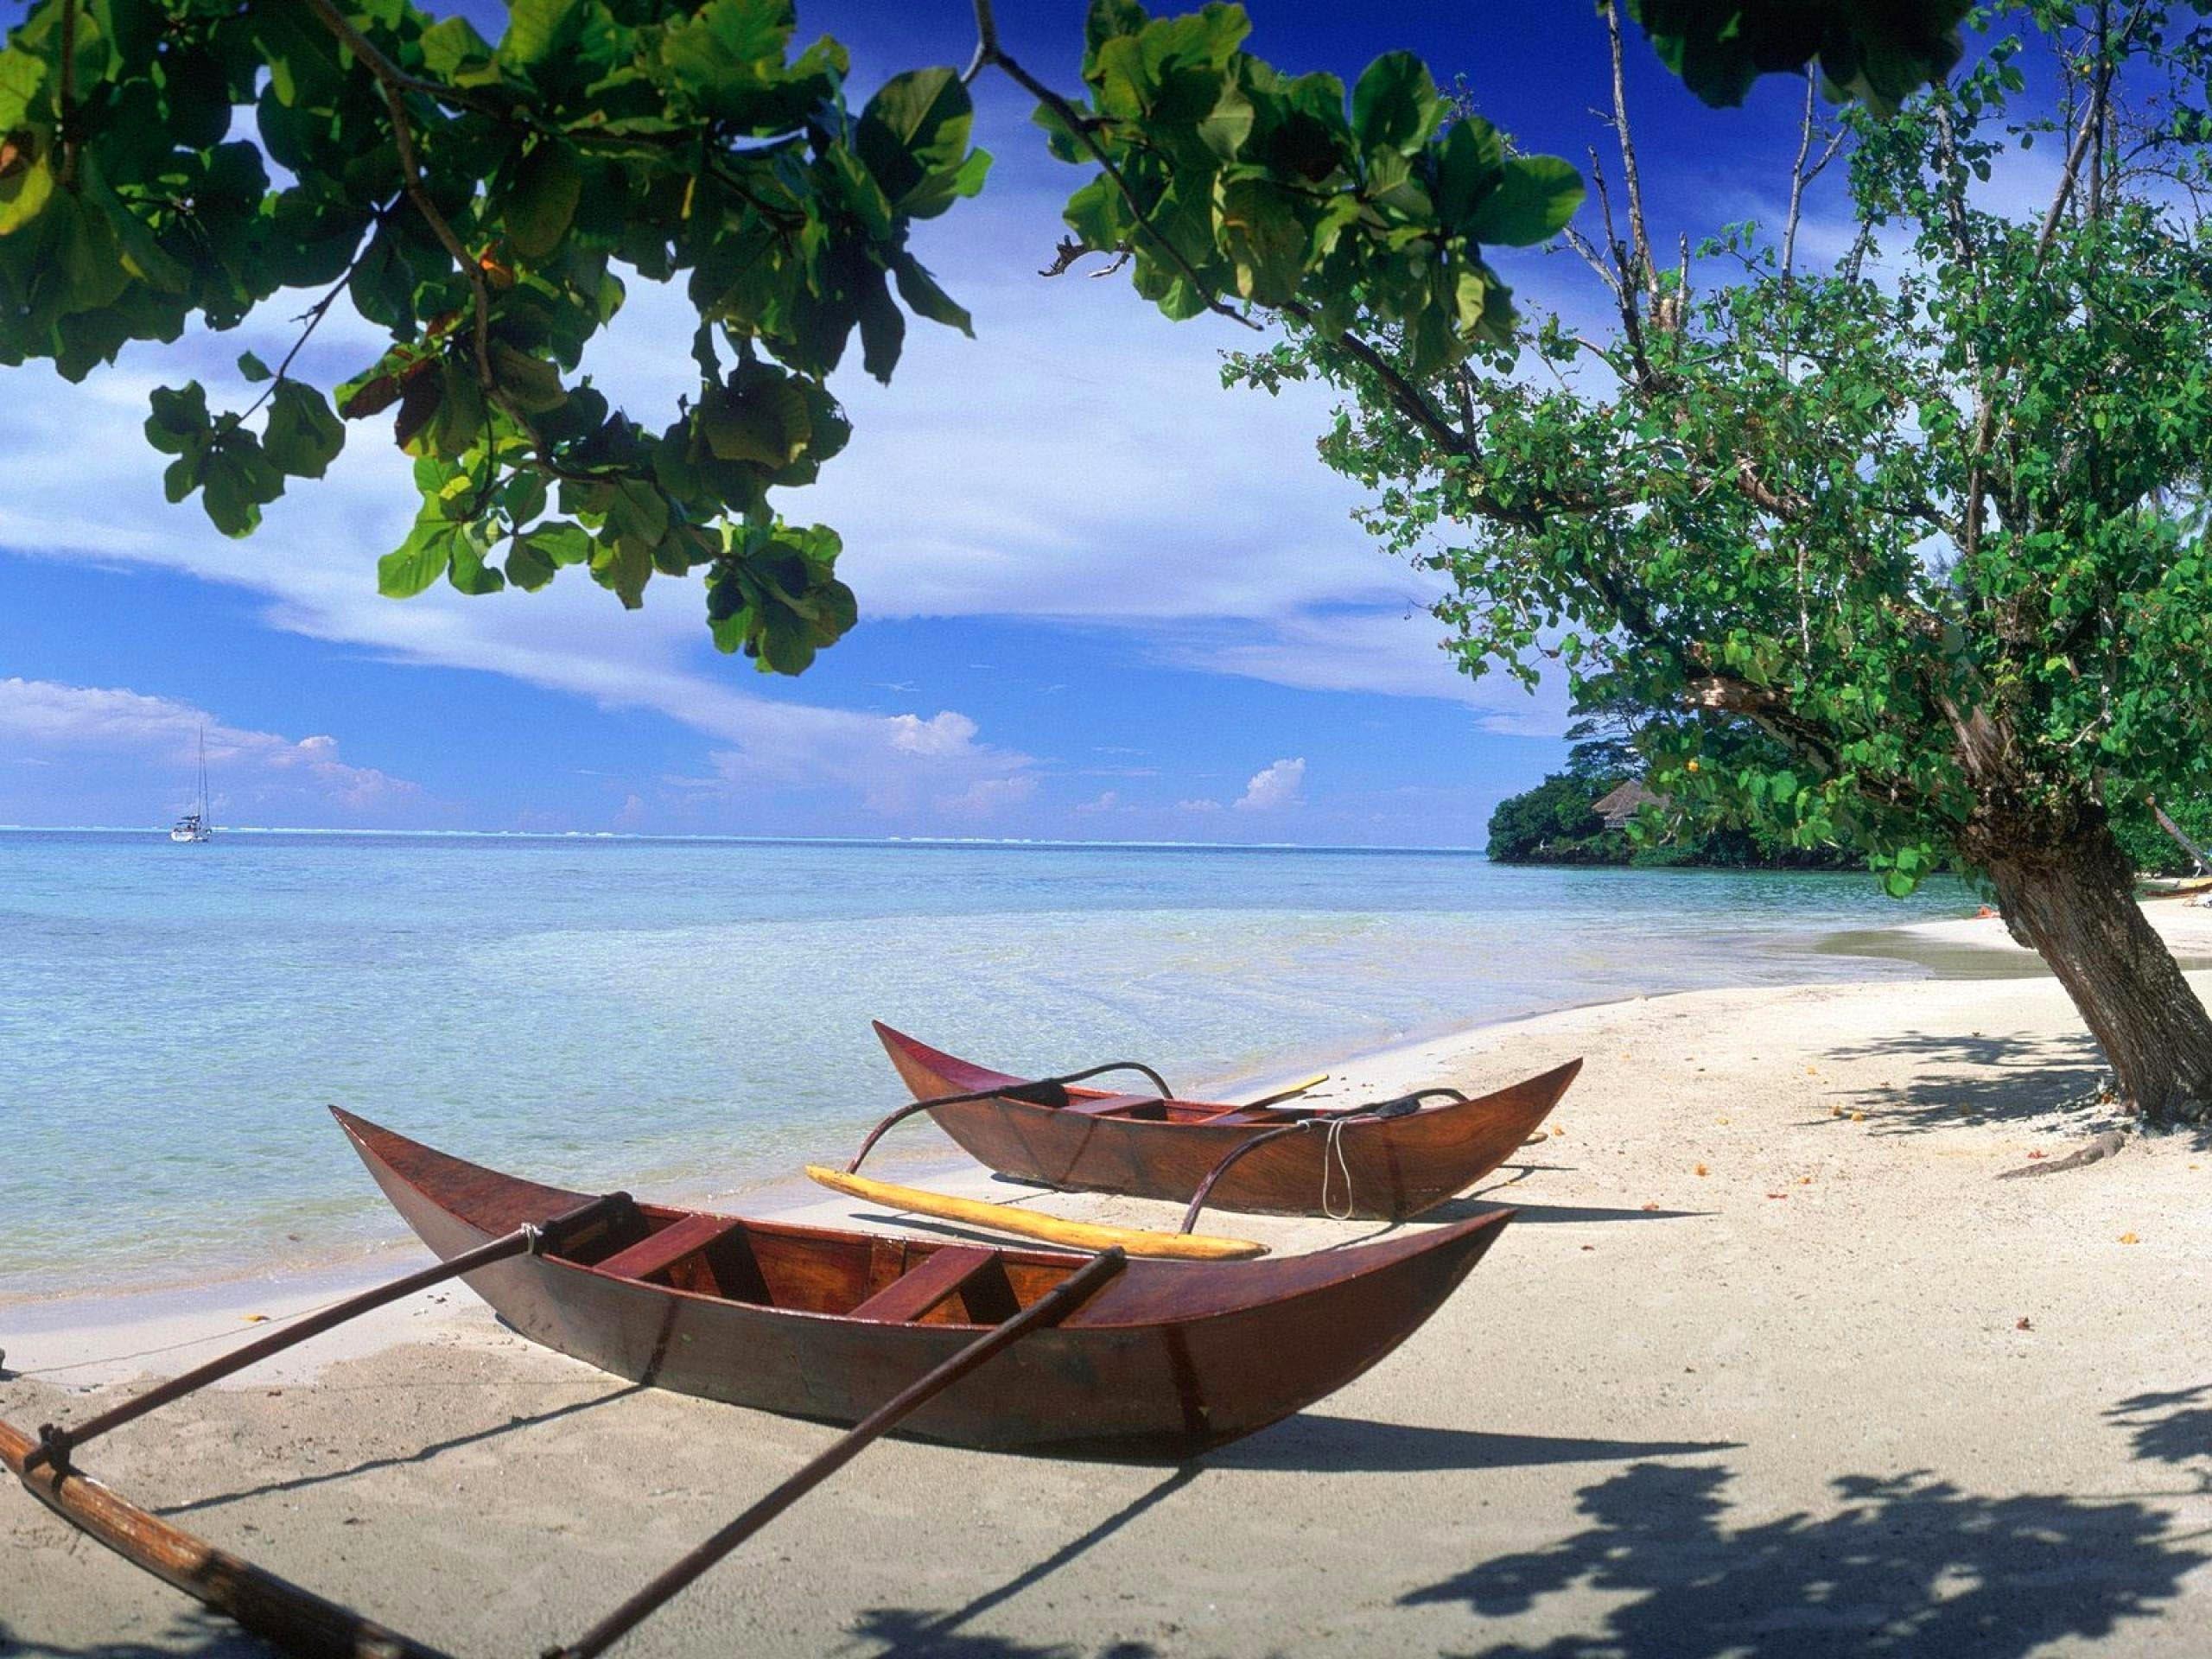 arbre – bateau – ciel bleu – feuille – horizon – mer – nuage